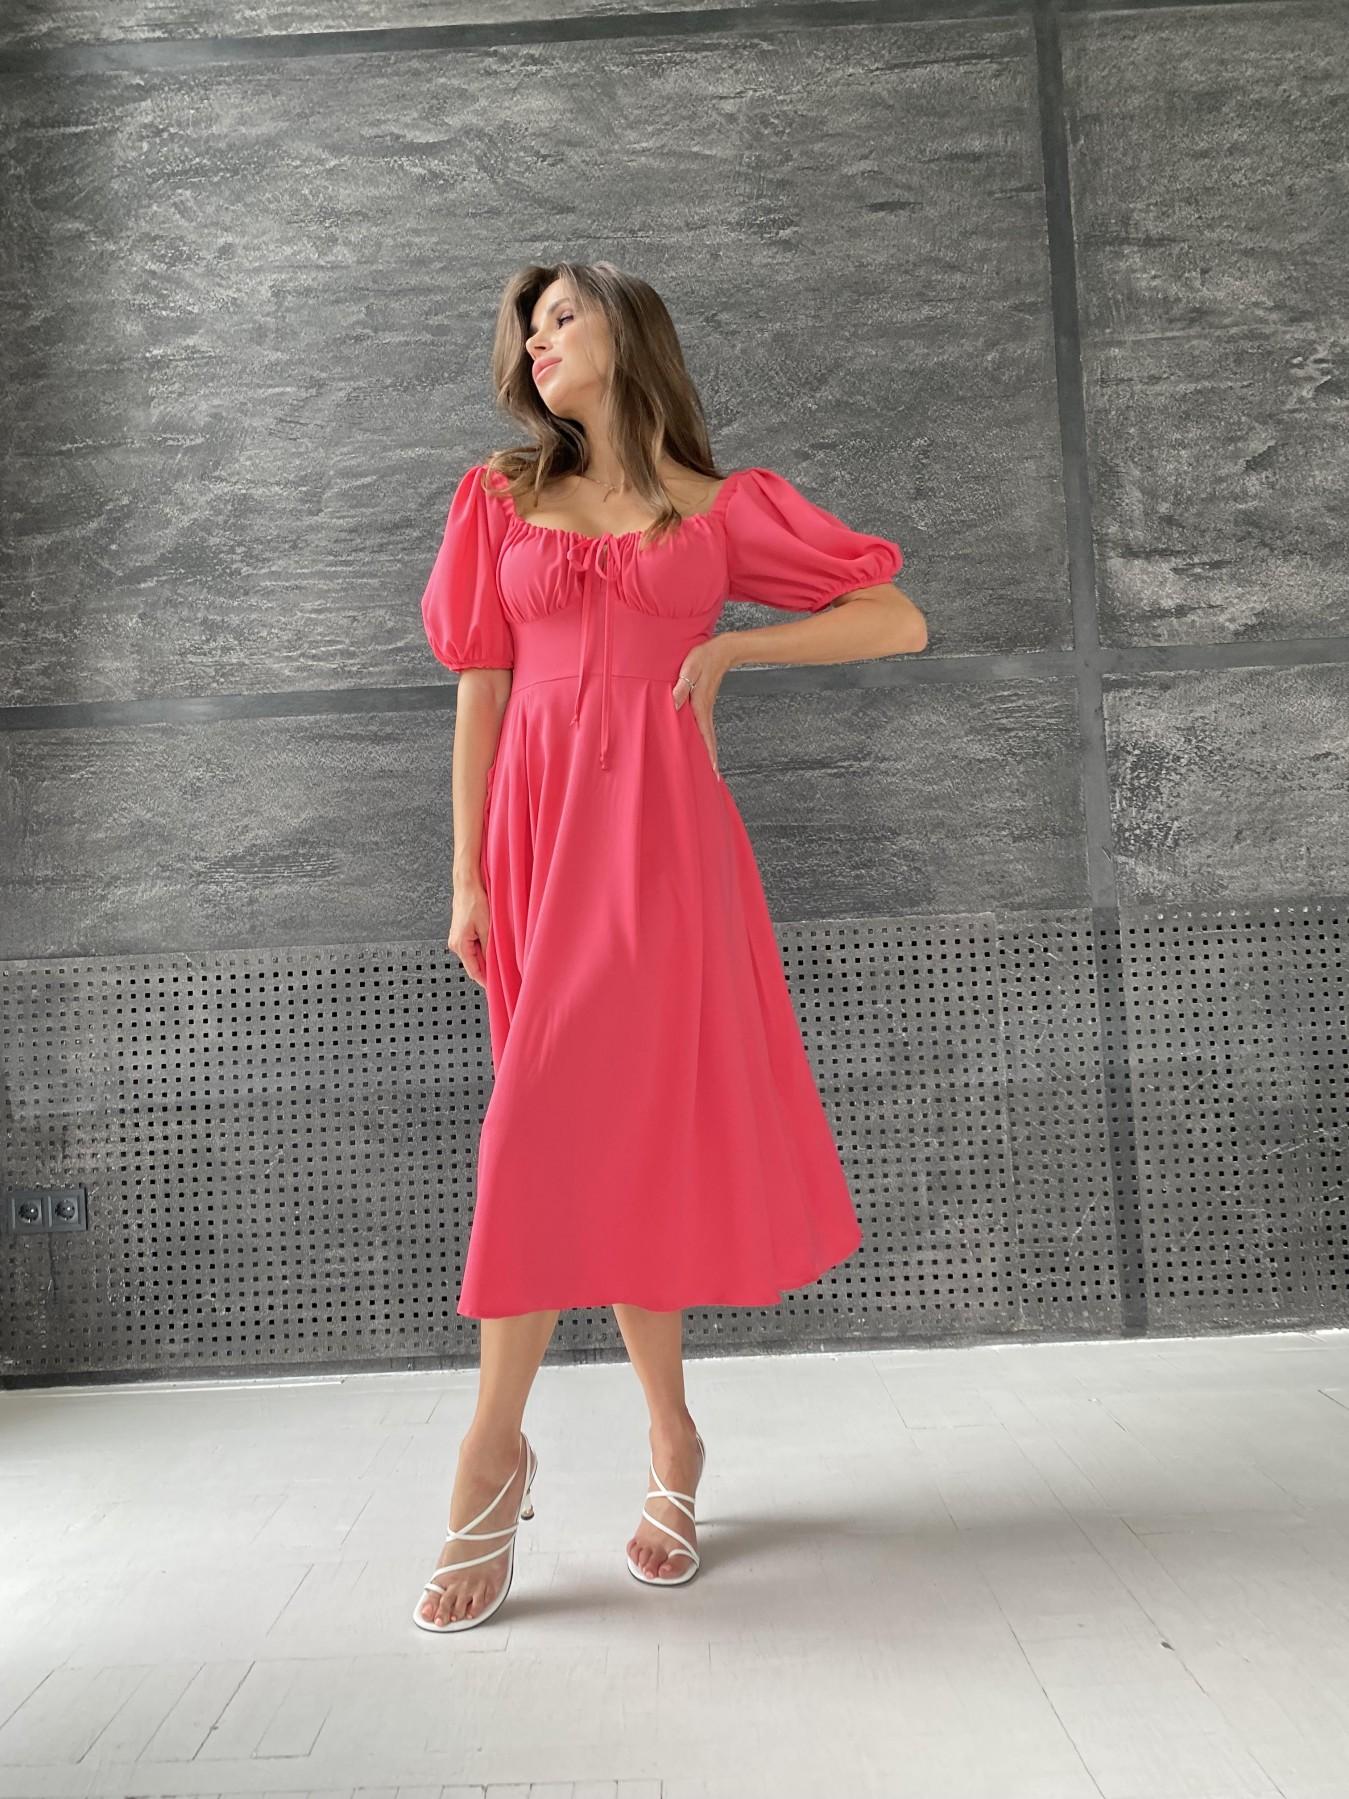 Кисес Миди платье из шифона креп 11443 АРТ. 48314 Цвет: Коралл - фото 5, интернет магазин tm-modus.ru